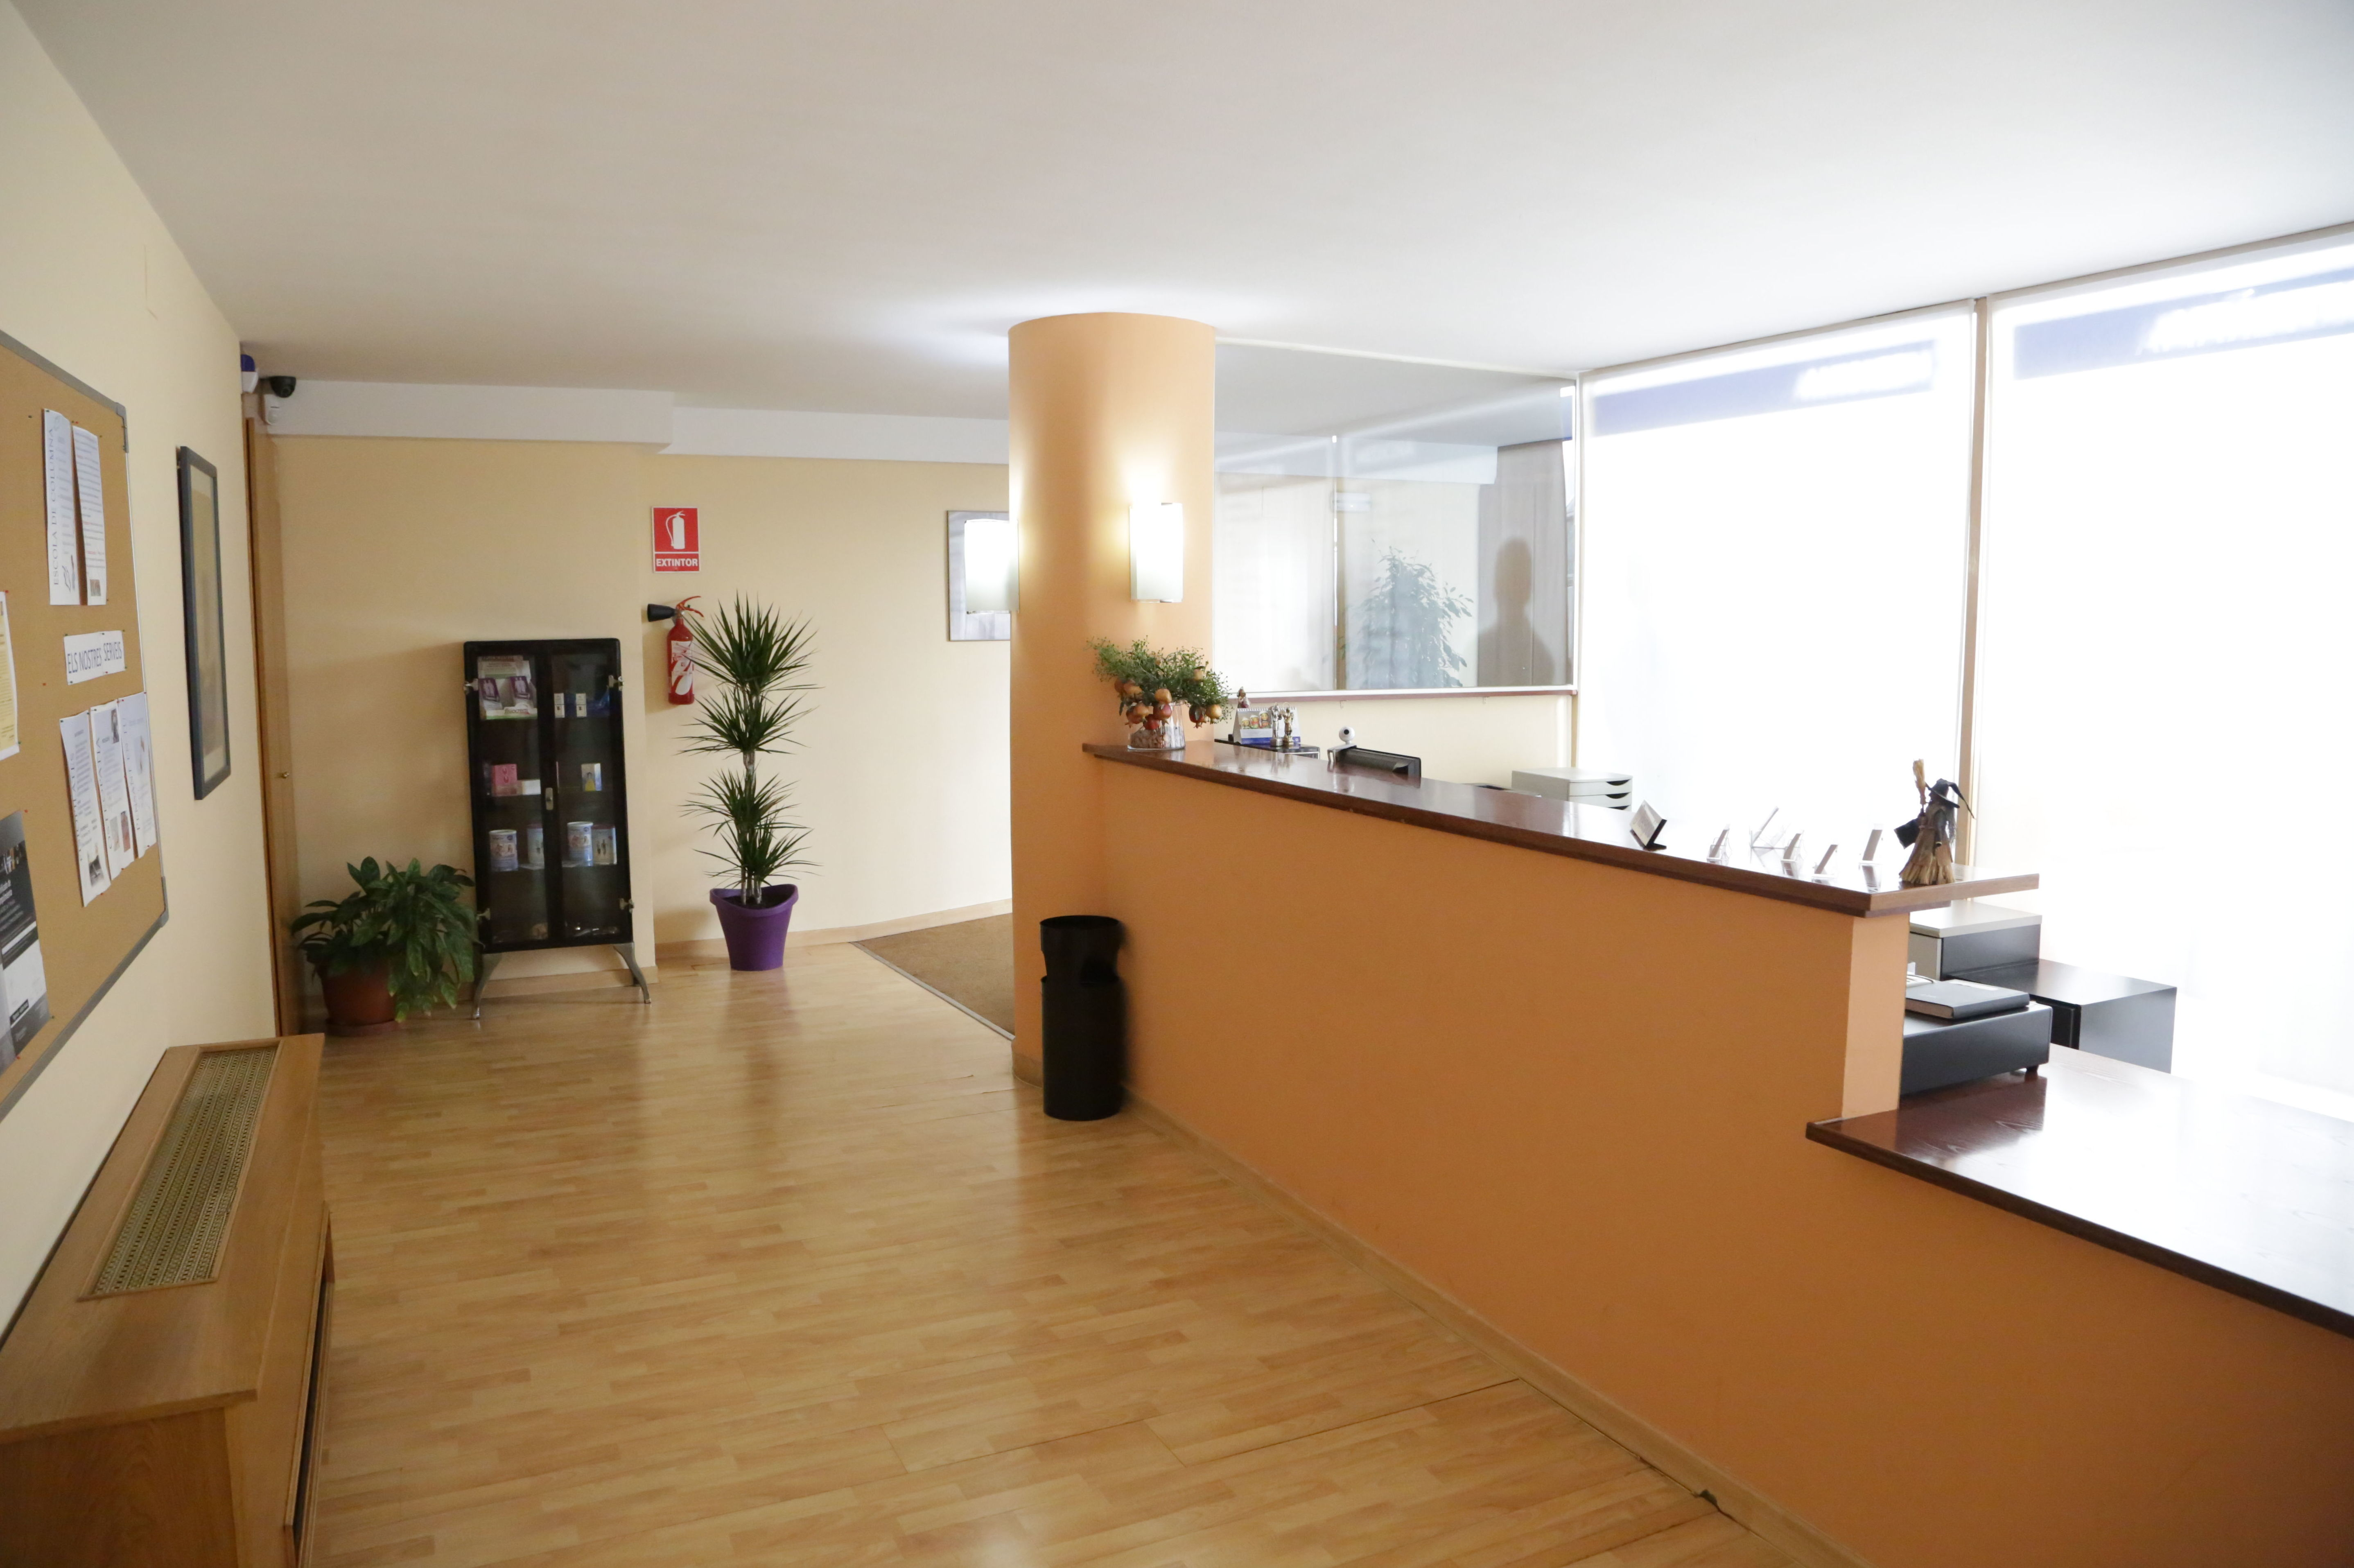 Foto 3 de Fisioterapia en  | Centro de Recuperación Funcional Vallés Mercè Ventura